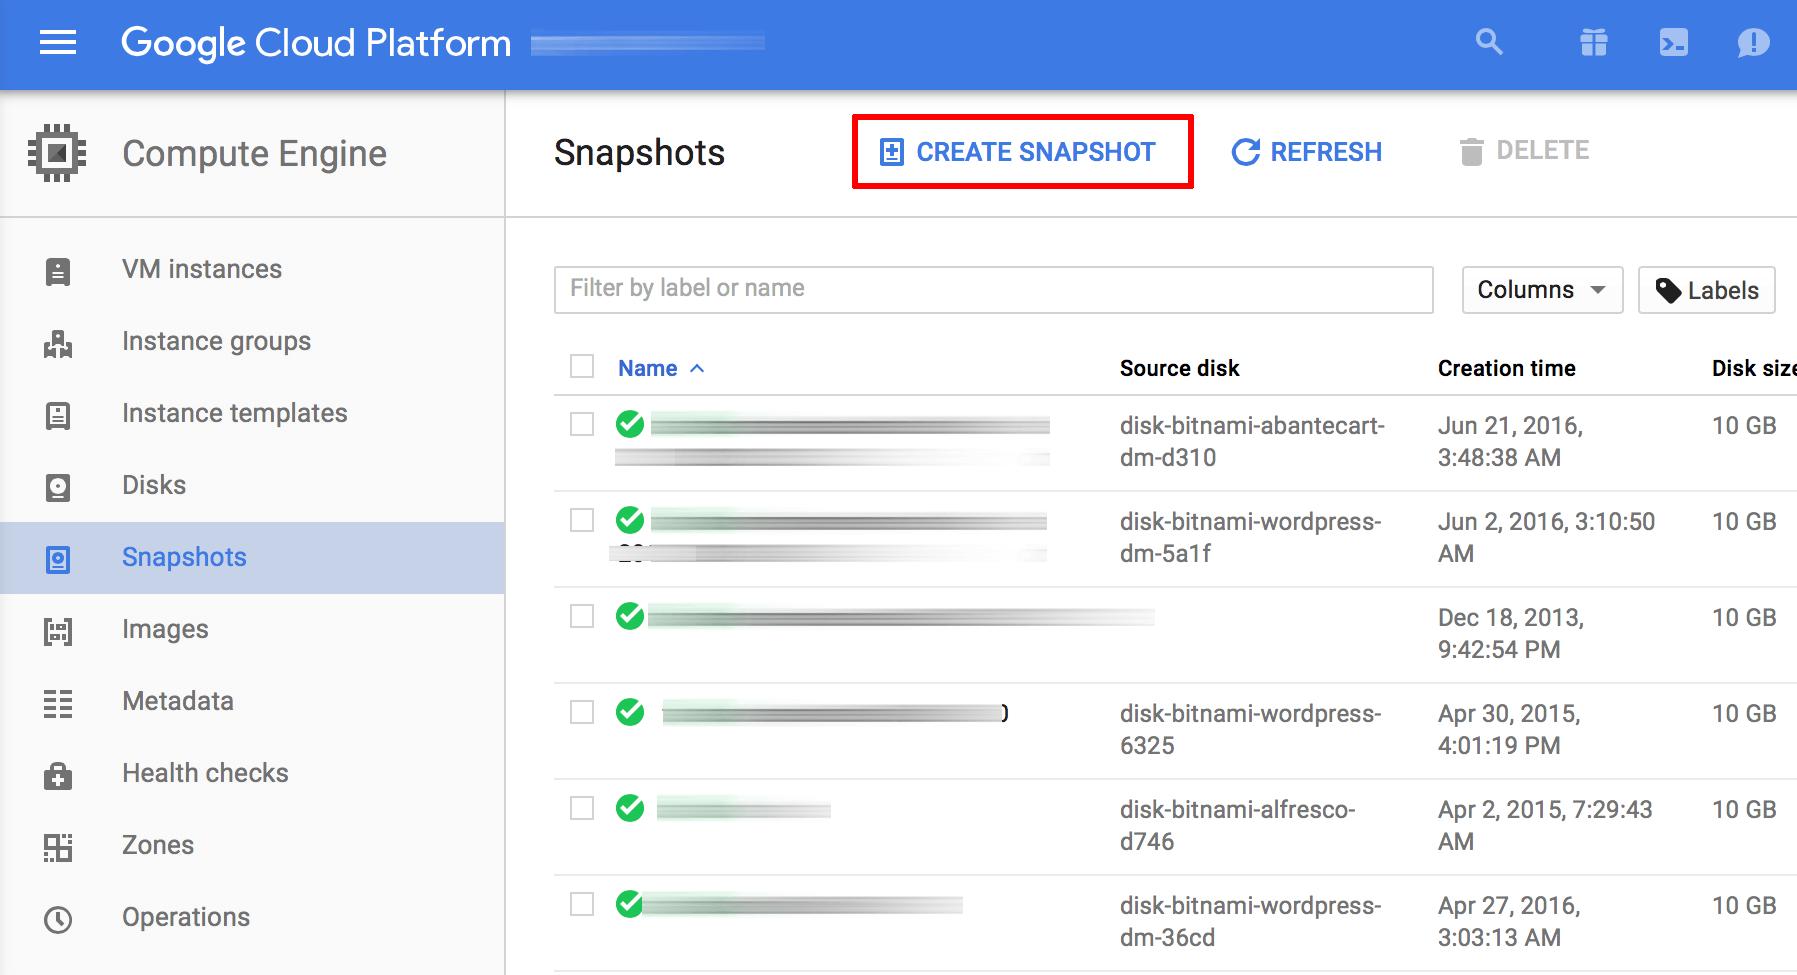 Server snapshot creation